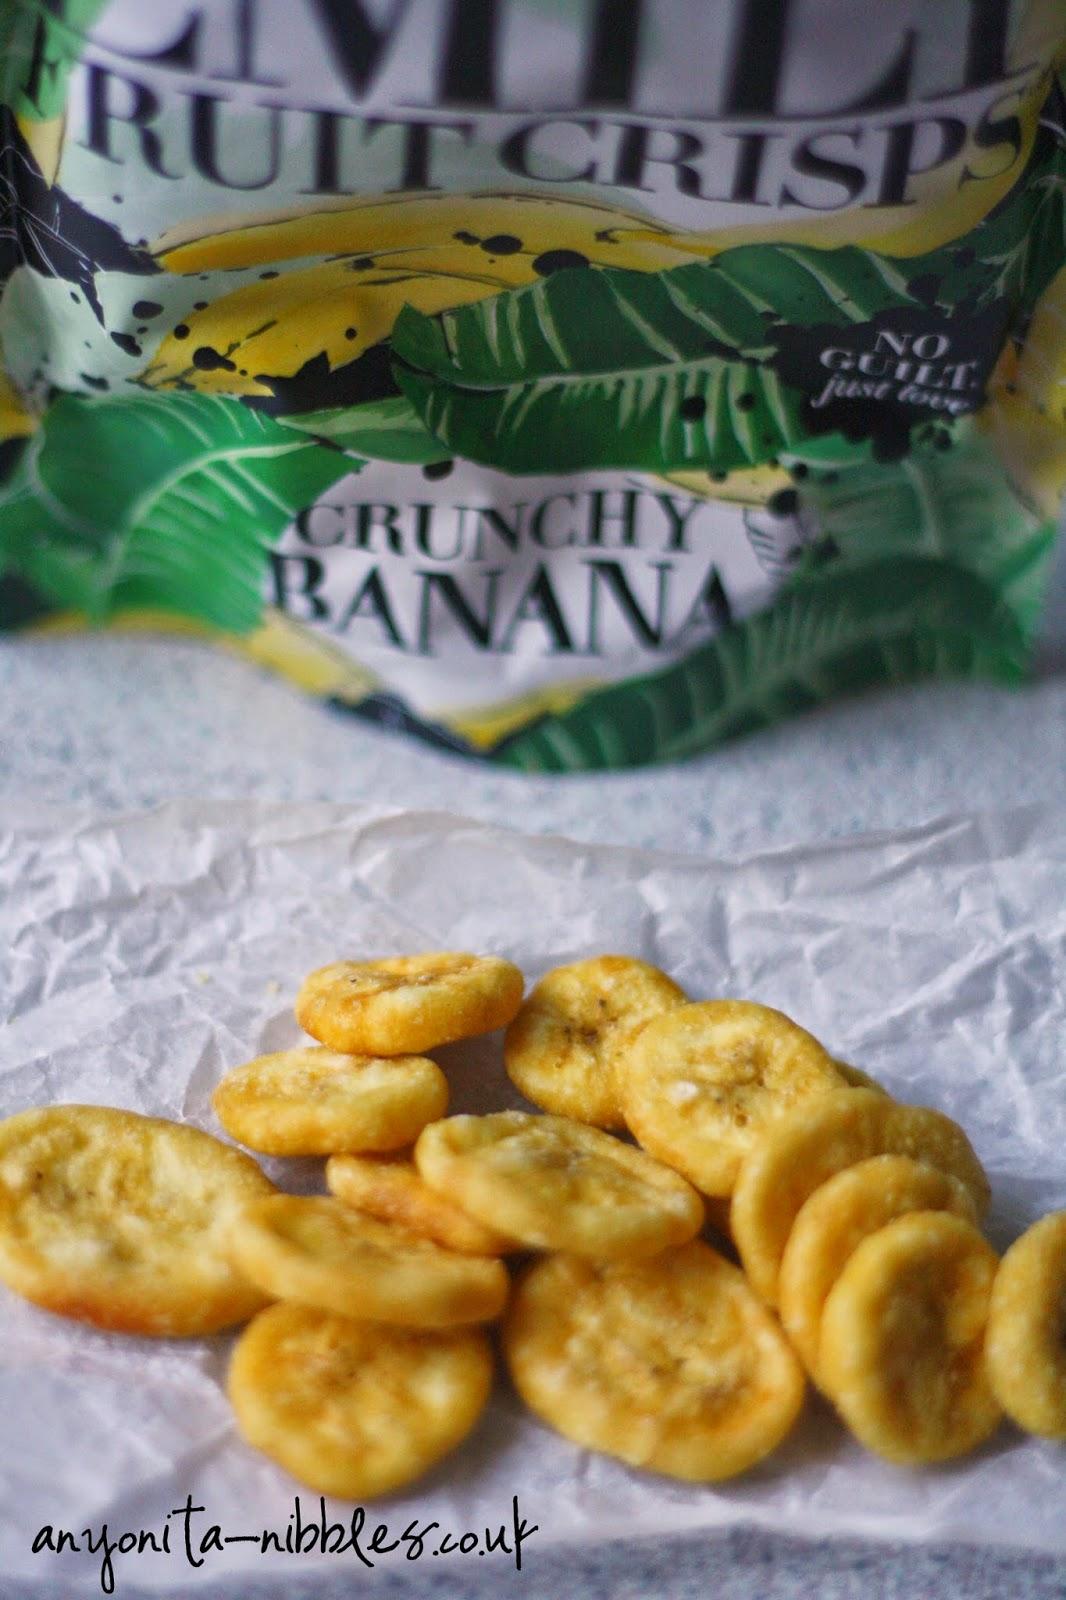 Emily Fruit Crisps Crunchy Banana by Anyonita-nibbles.co,.uk